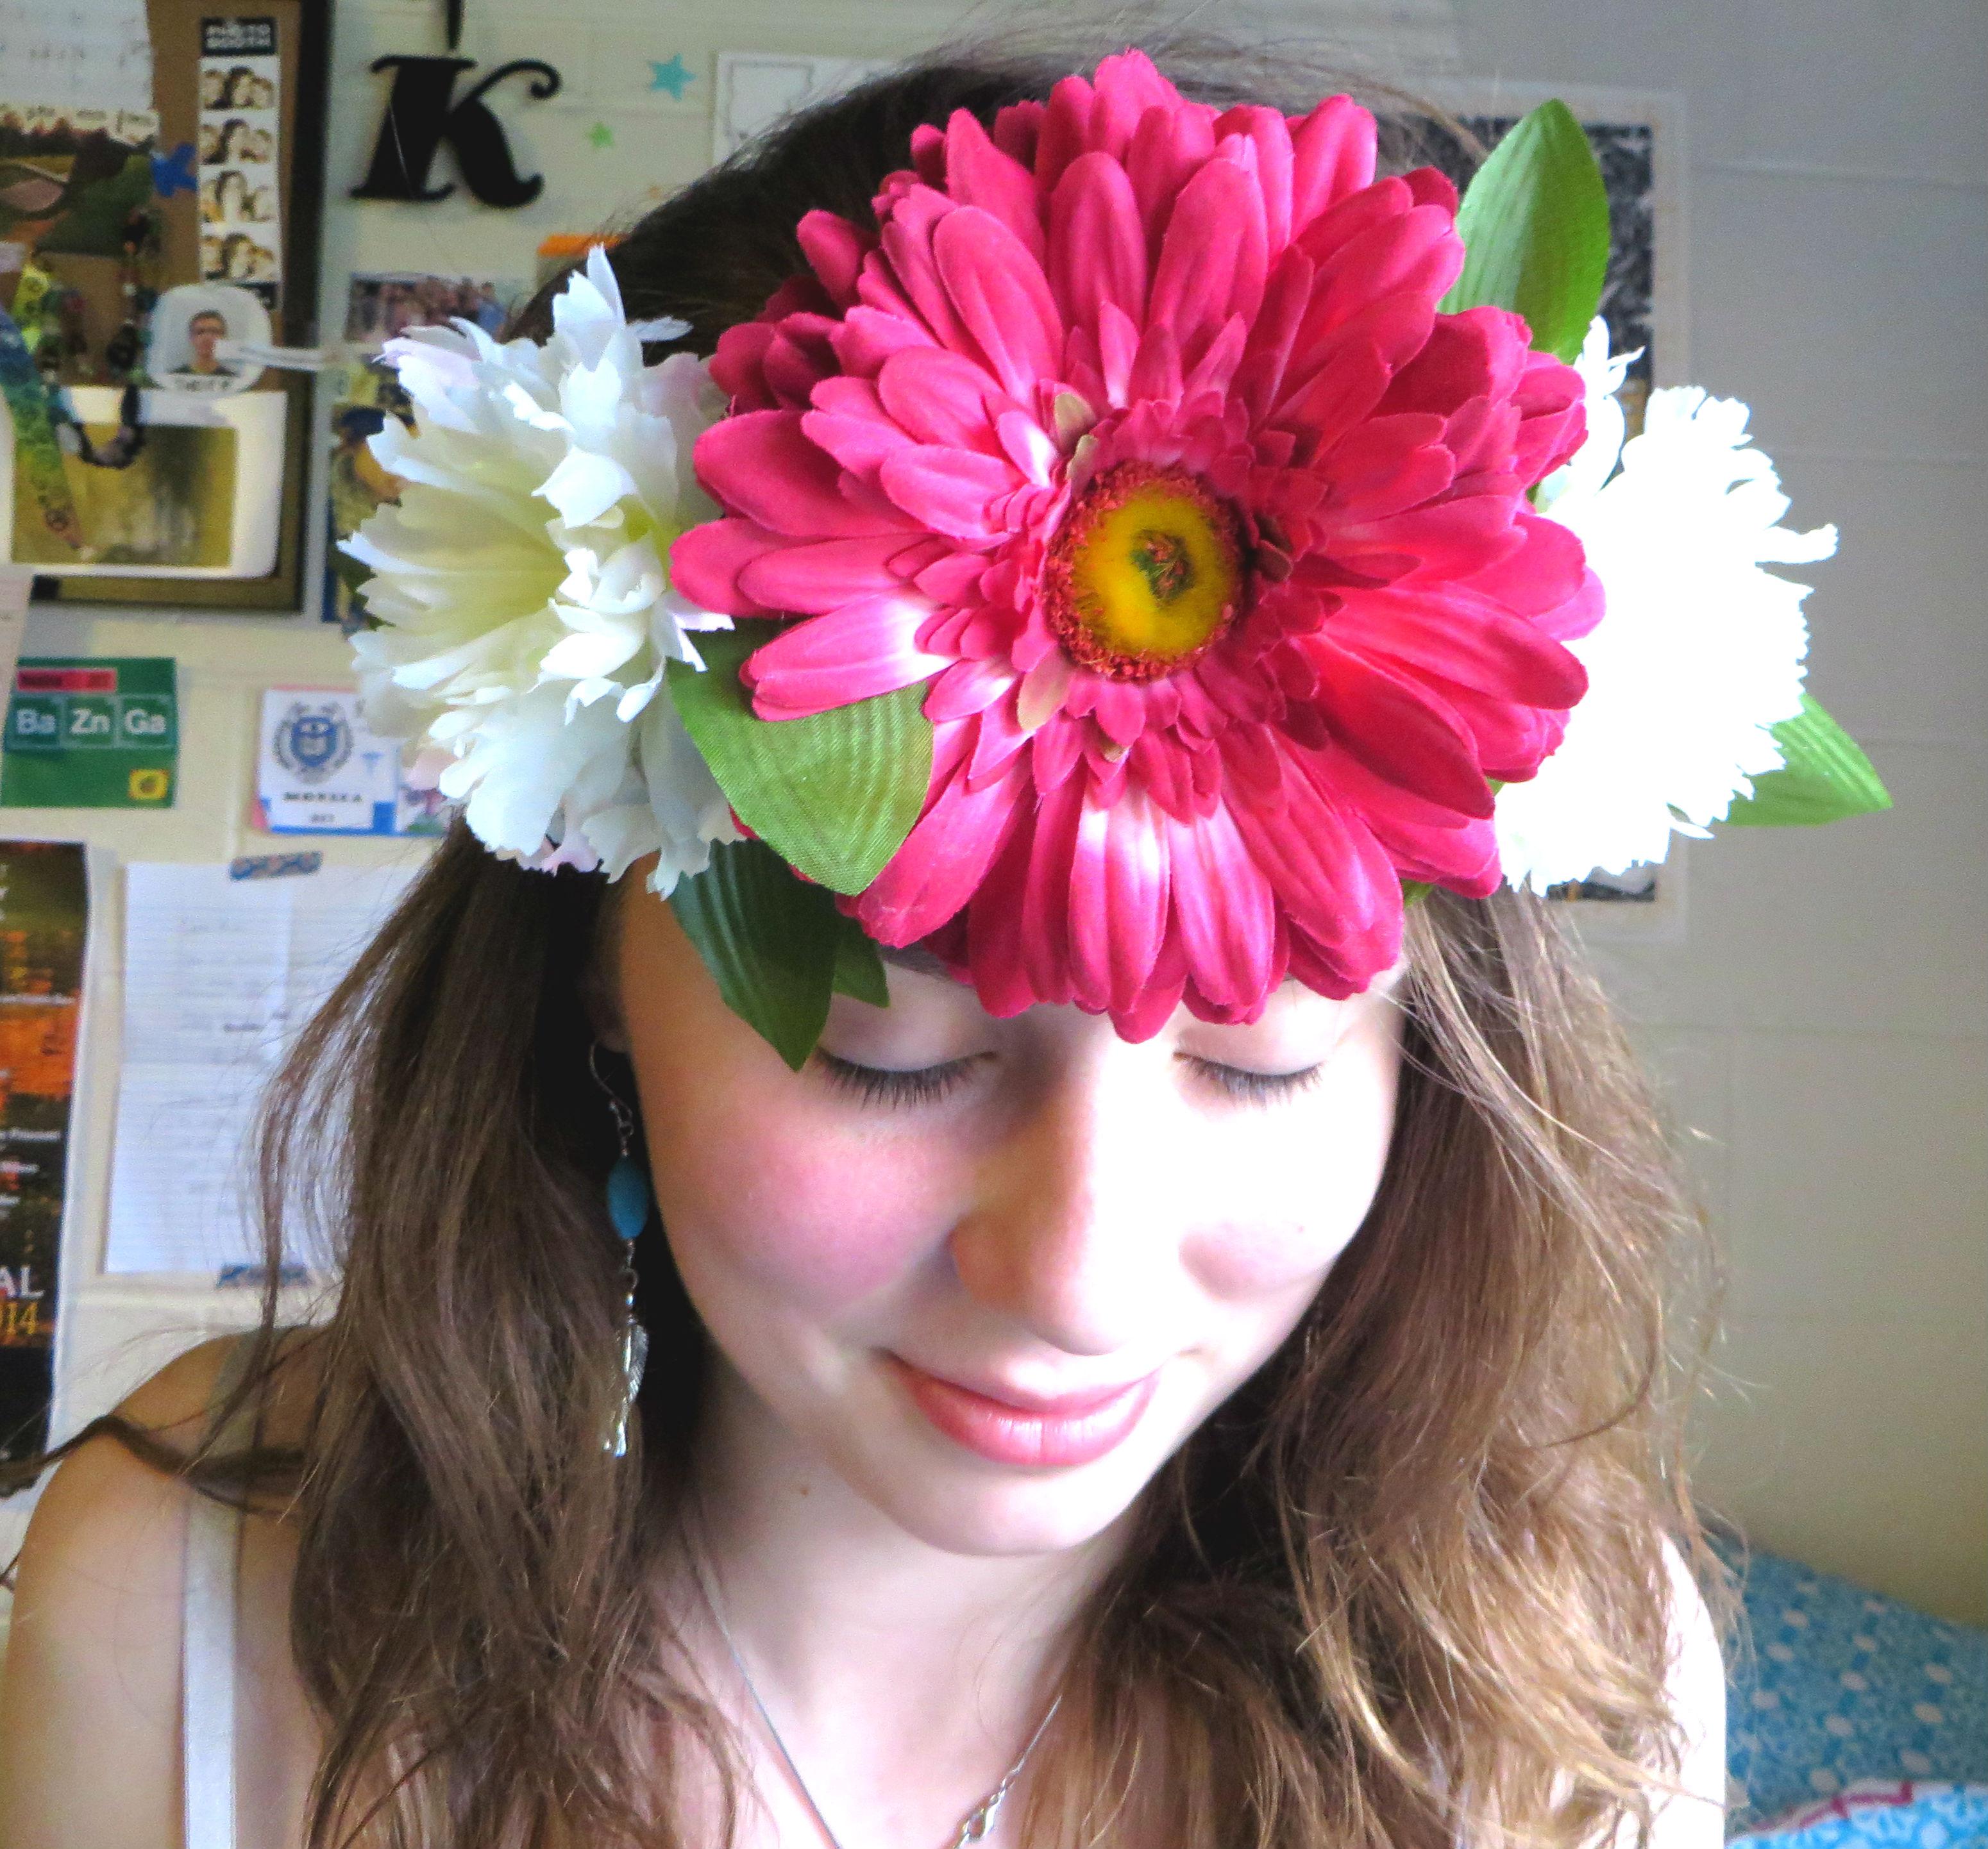 Flower crown color me kiki crown7 izmirmasajfo